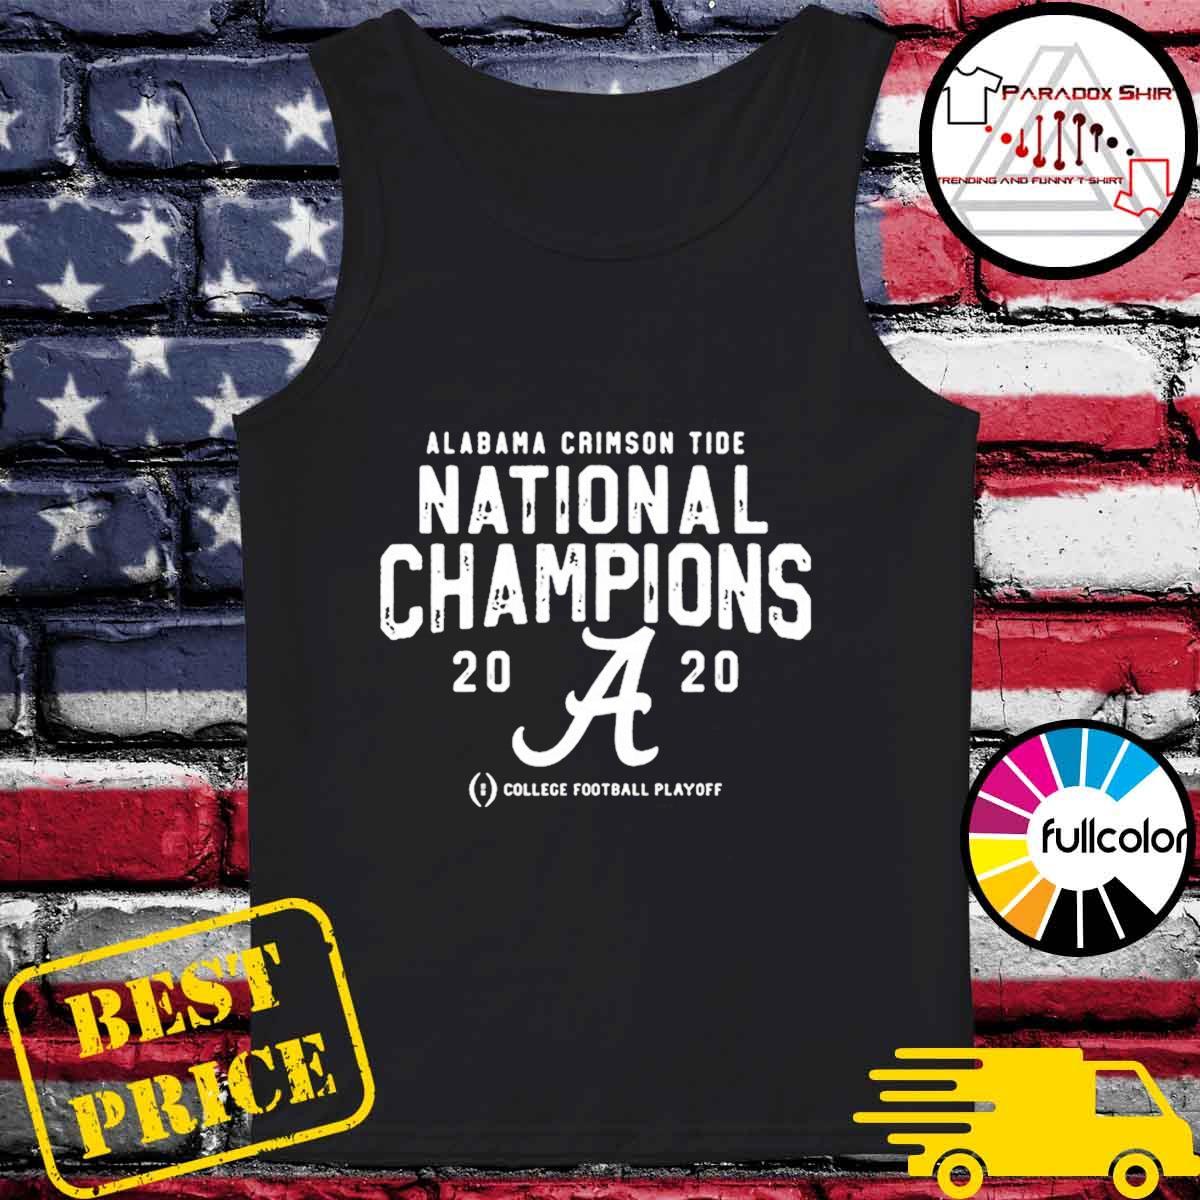 Alabama Crimson Tide College Football Playoff 2021 National Championship T-Shirt Tank-top